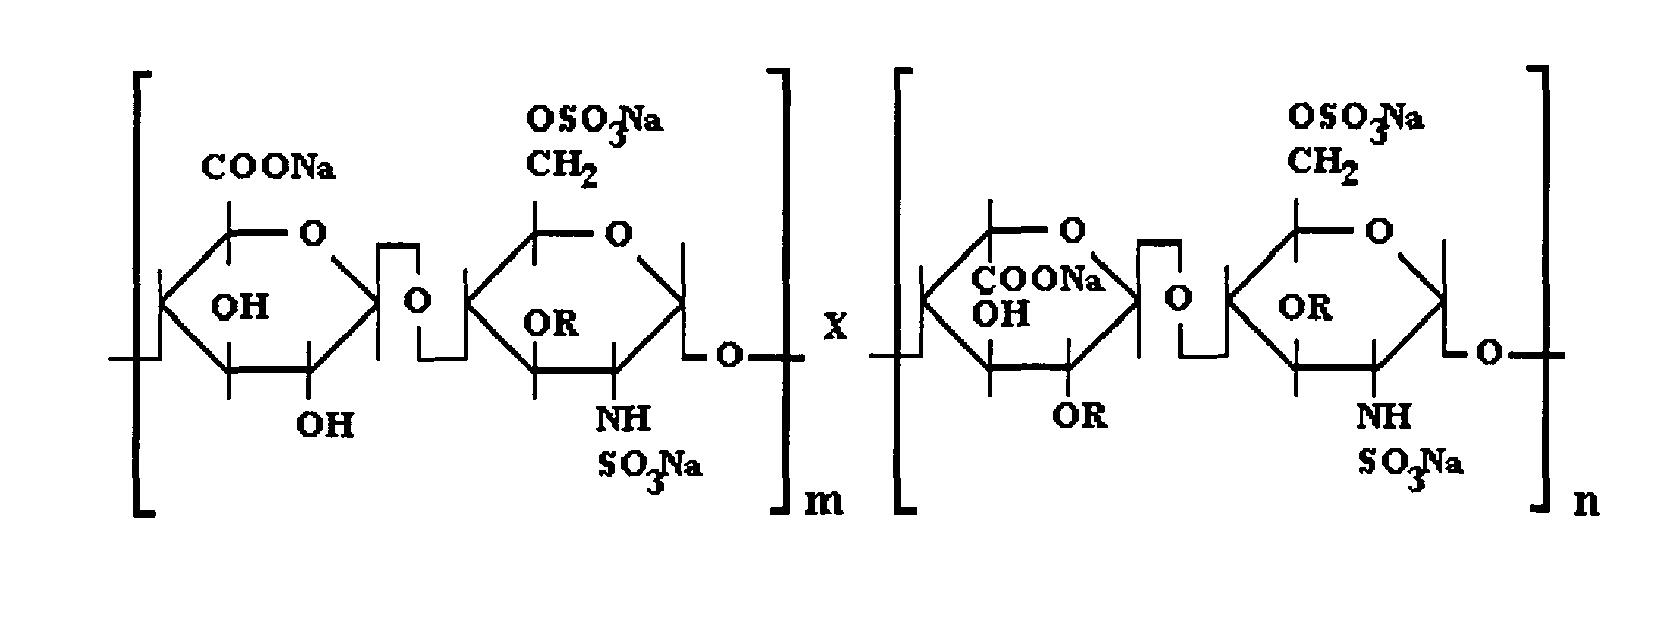 unit of viscosity